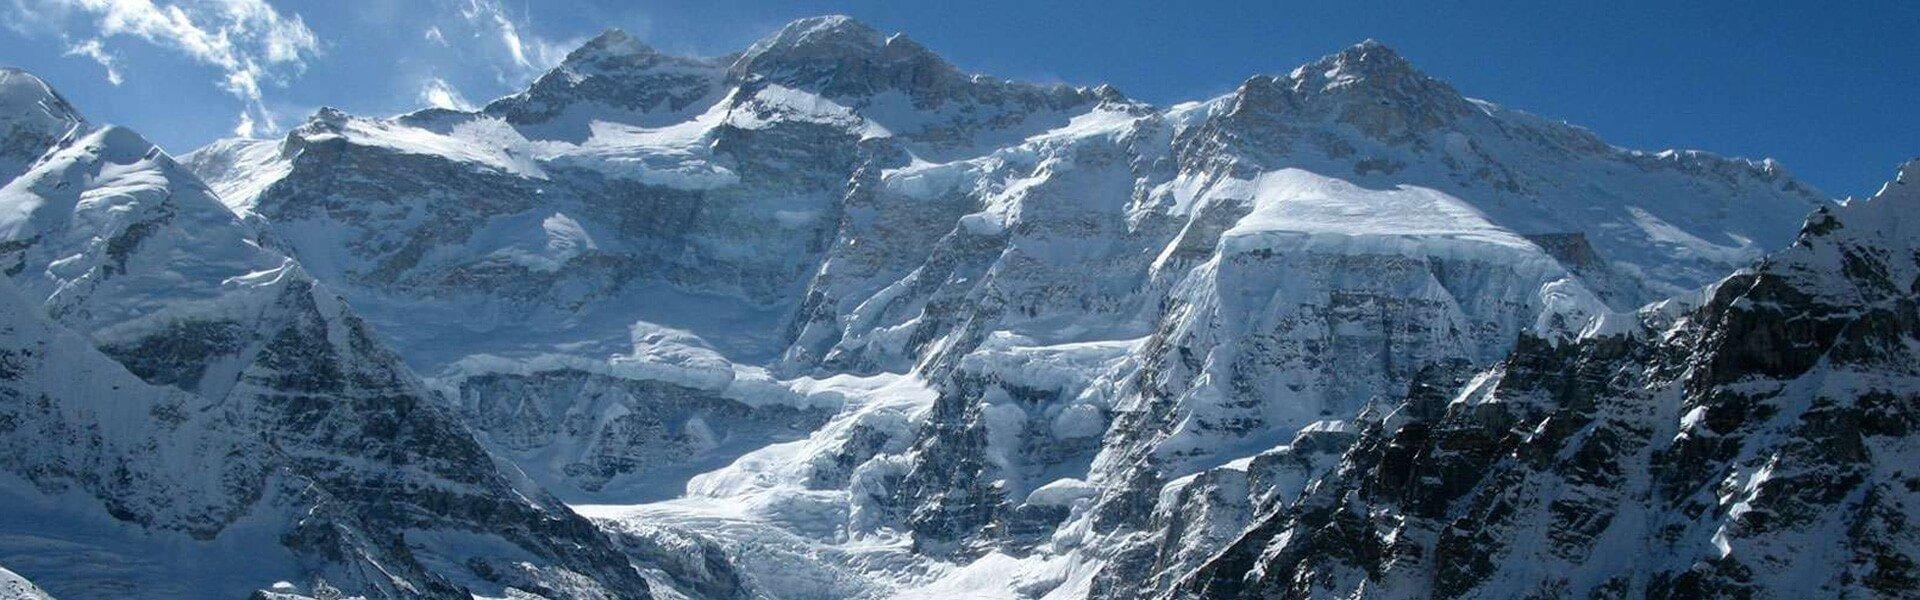 How difficult is Kanchenjunga trek